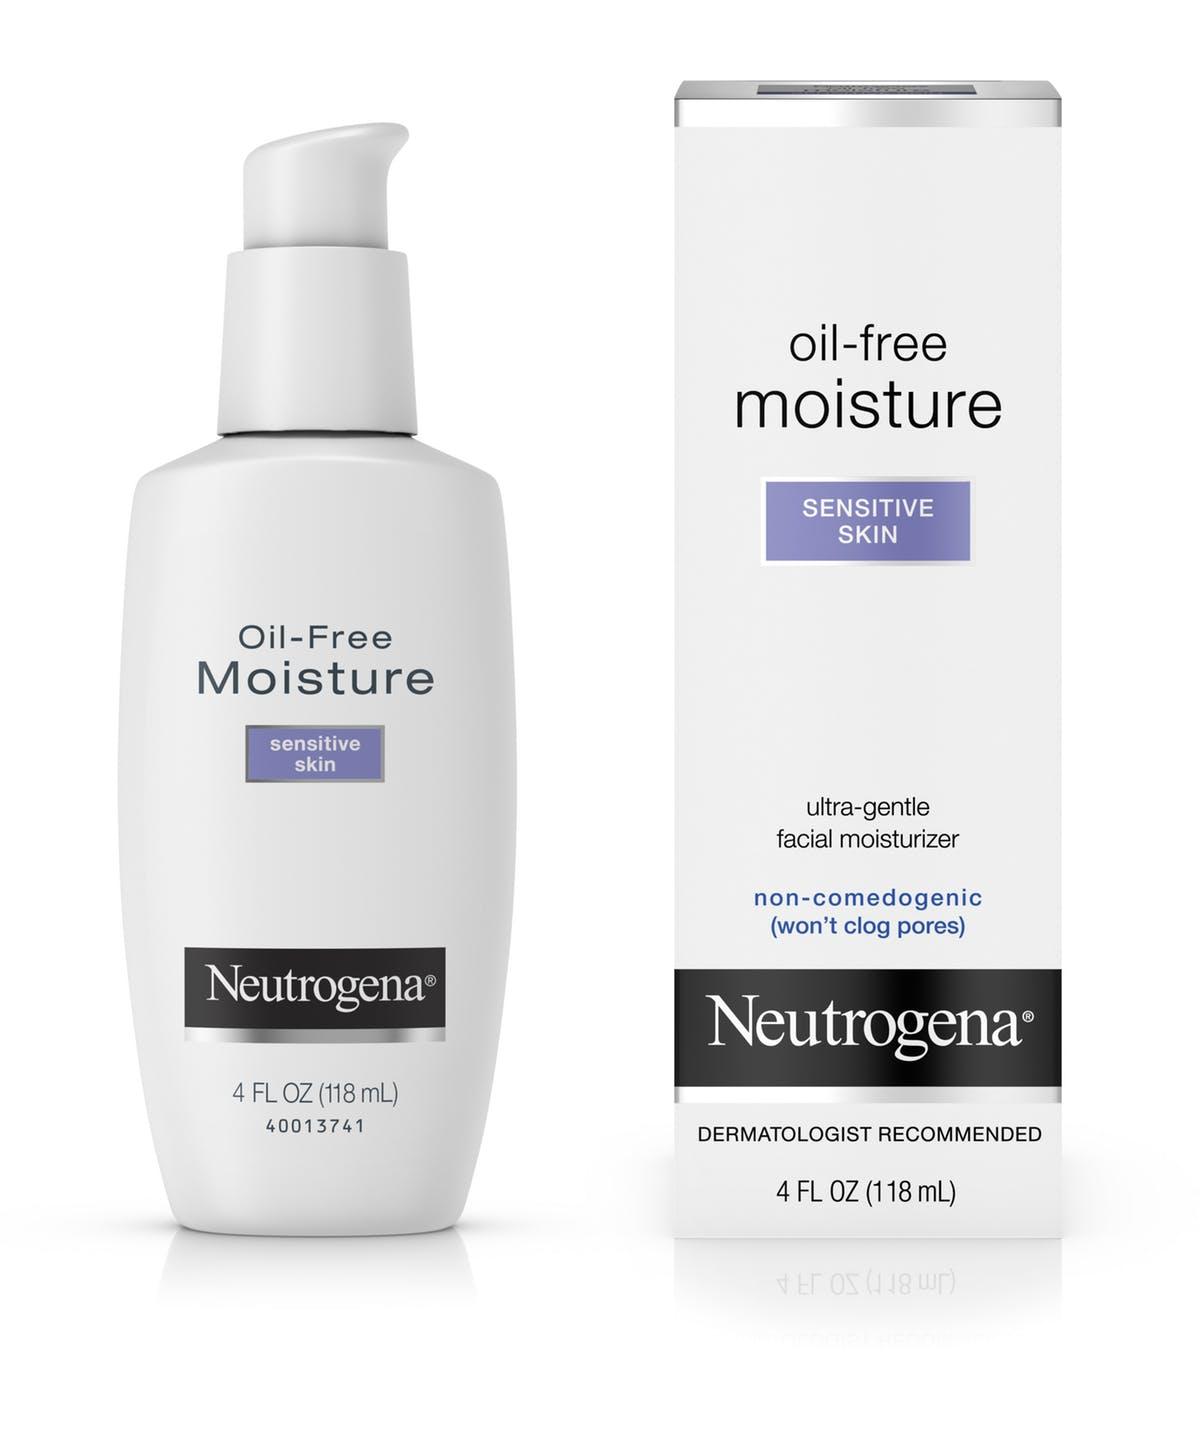 Neutrogena Eczema Cream